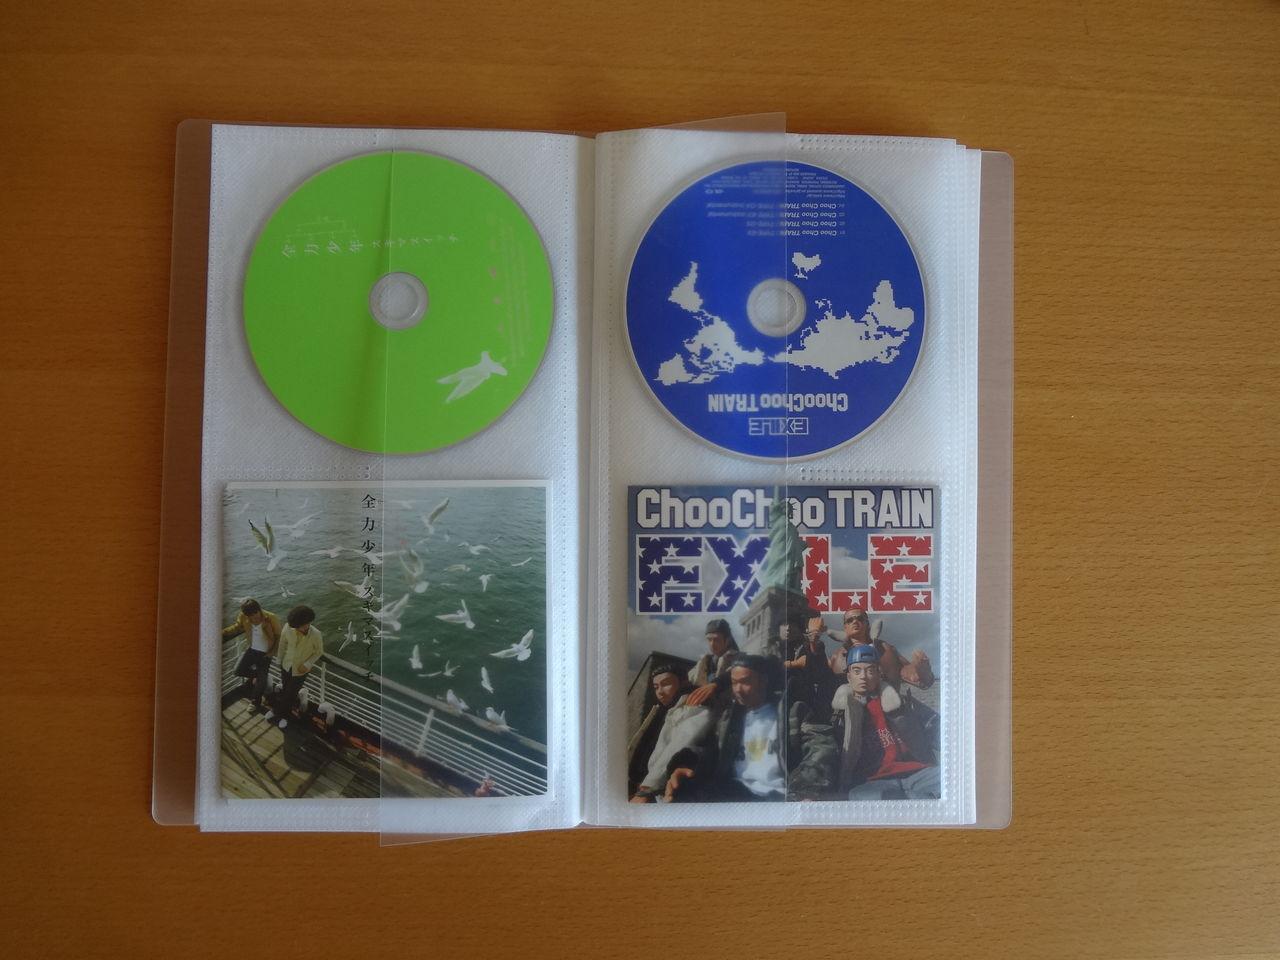 CDと歌詞カードを互い違いに入れて、ファイルの厚さが均一になるようにしました。